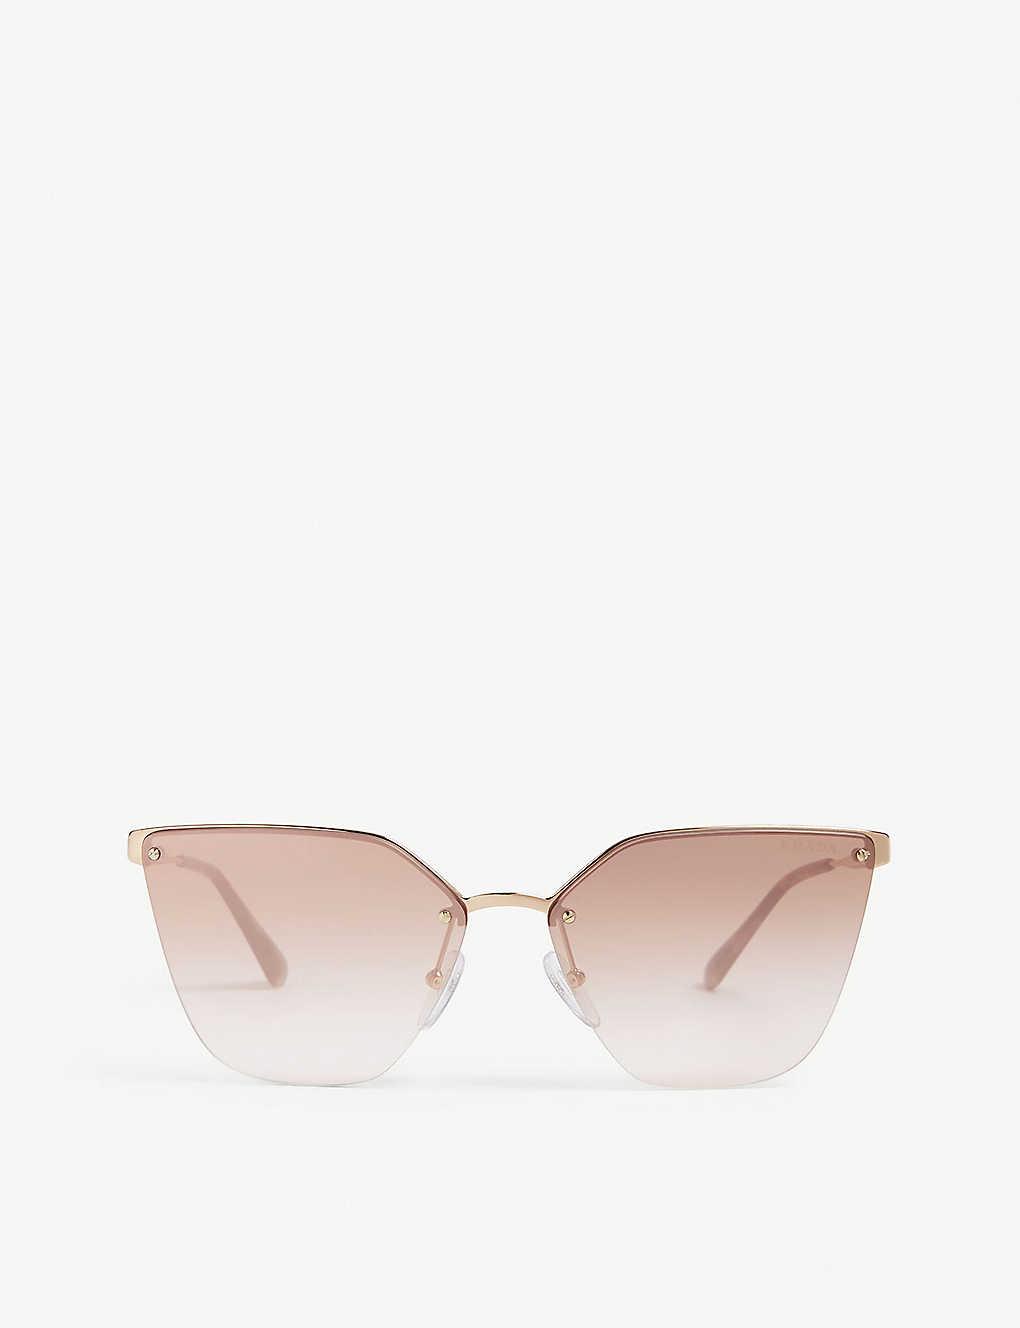 7bc56b2c98f1 PRADA - PR68T cat-eye sunglasses | Selfridges.com